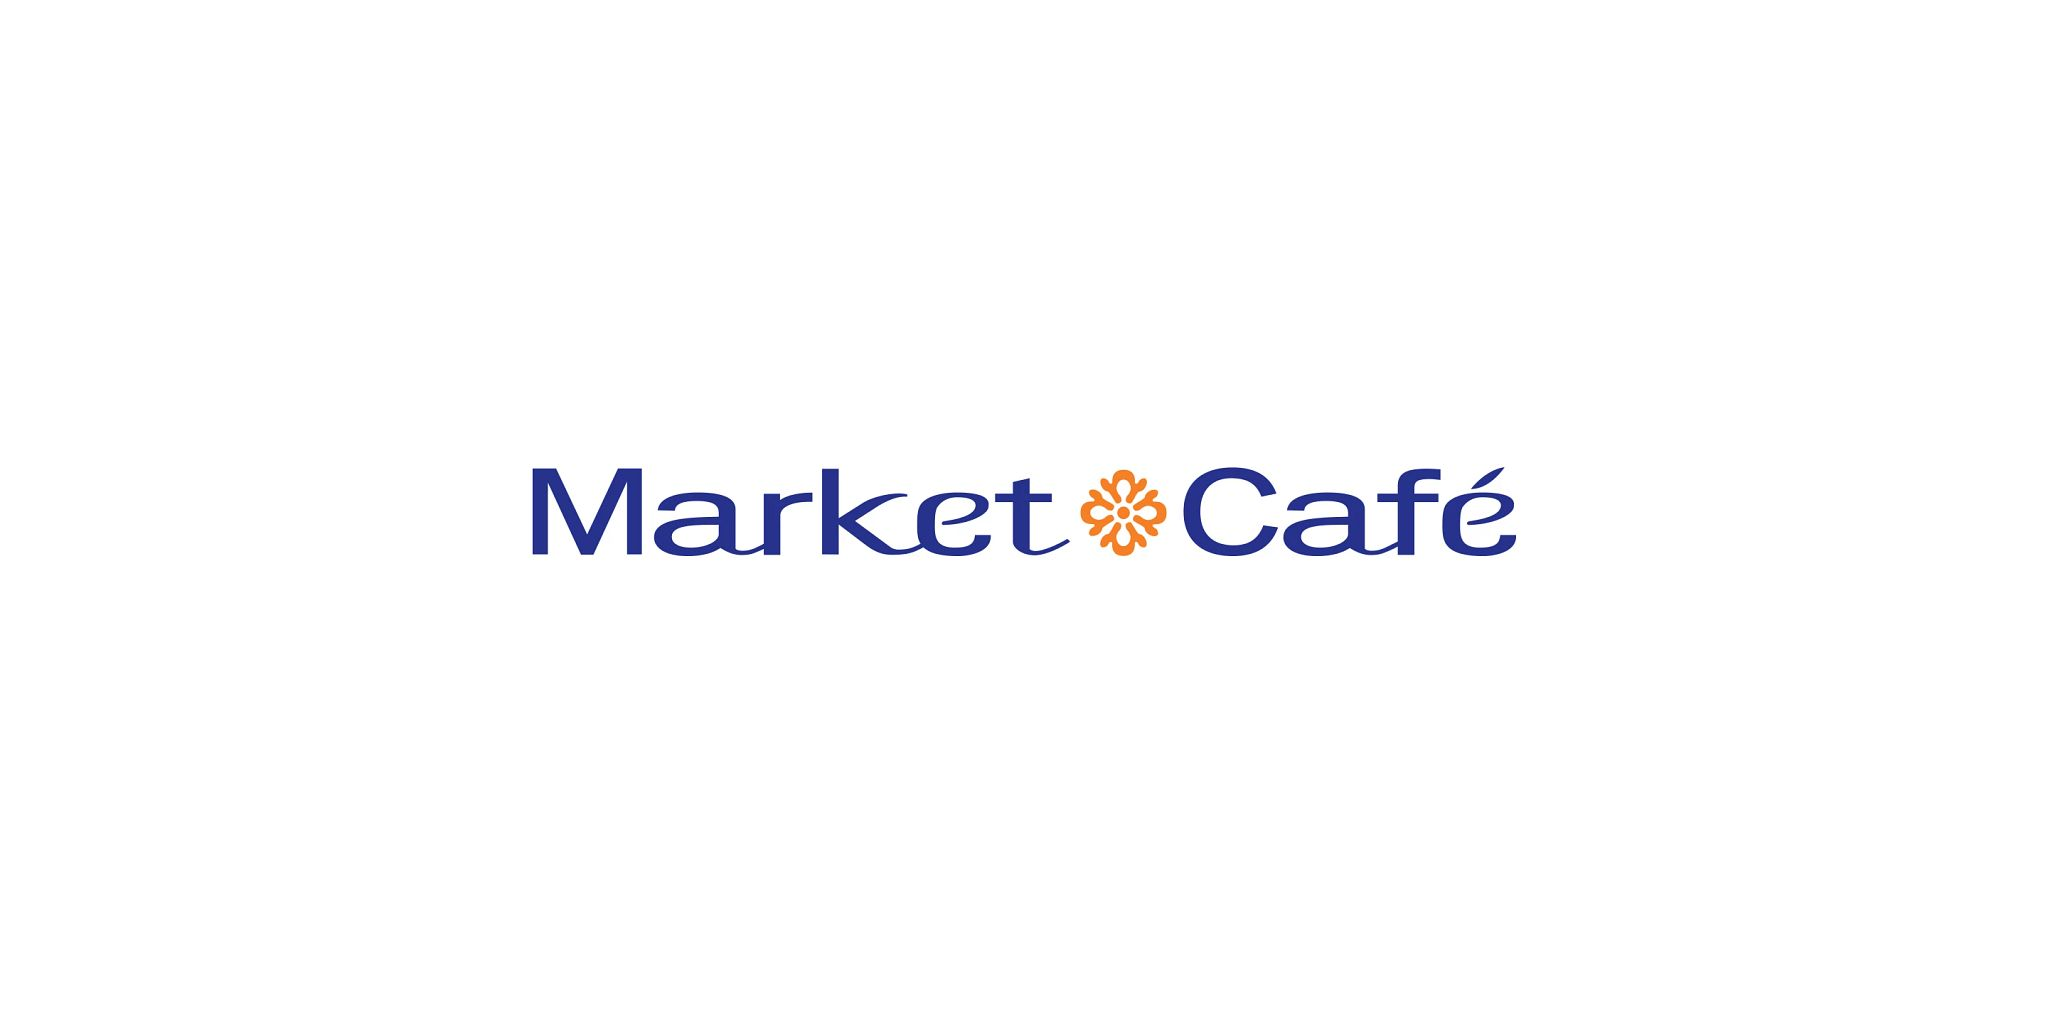 Market Cafe Serving Mexican Cuisine